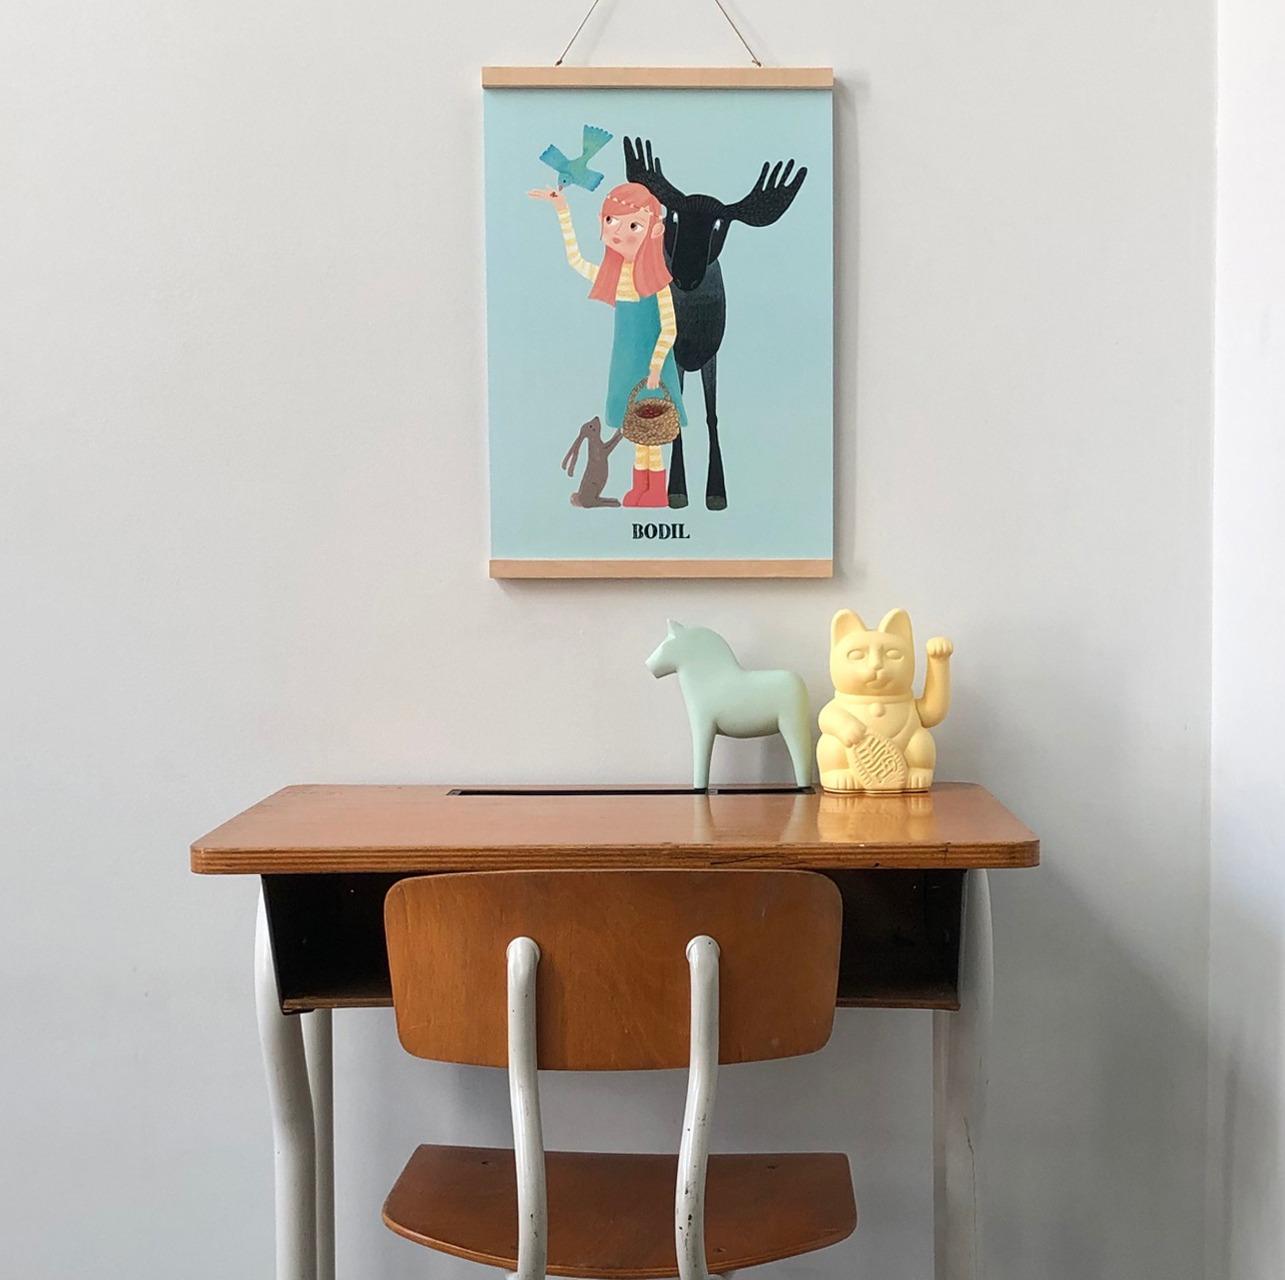 kinderkamervintage - vintage kinderbureautje - handmade poster met naam